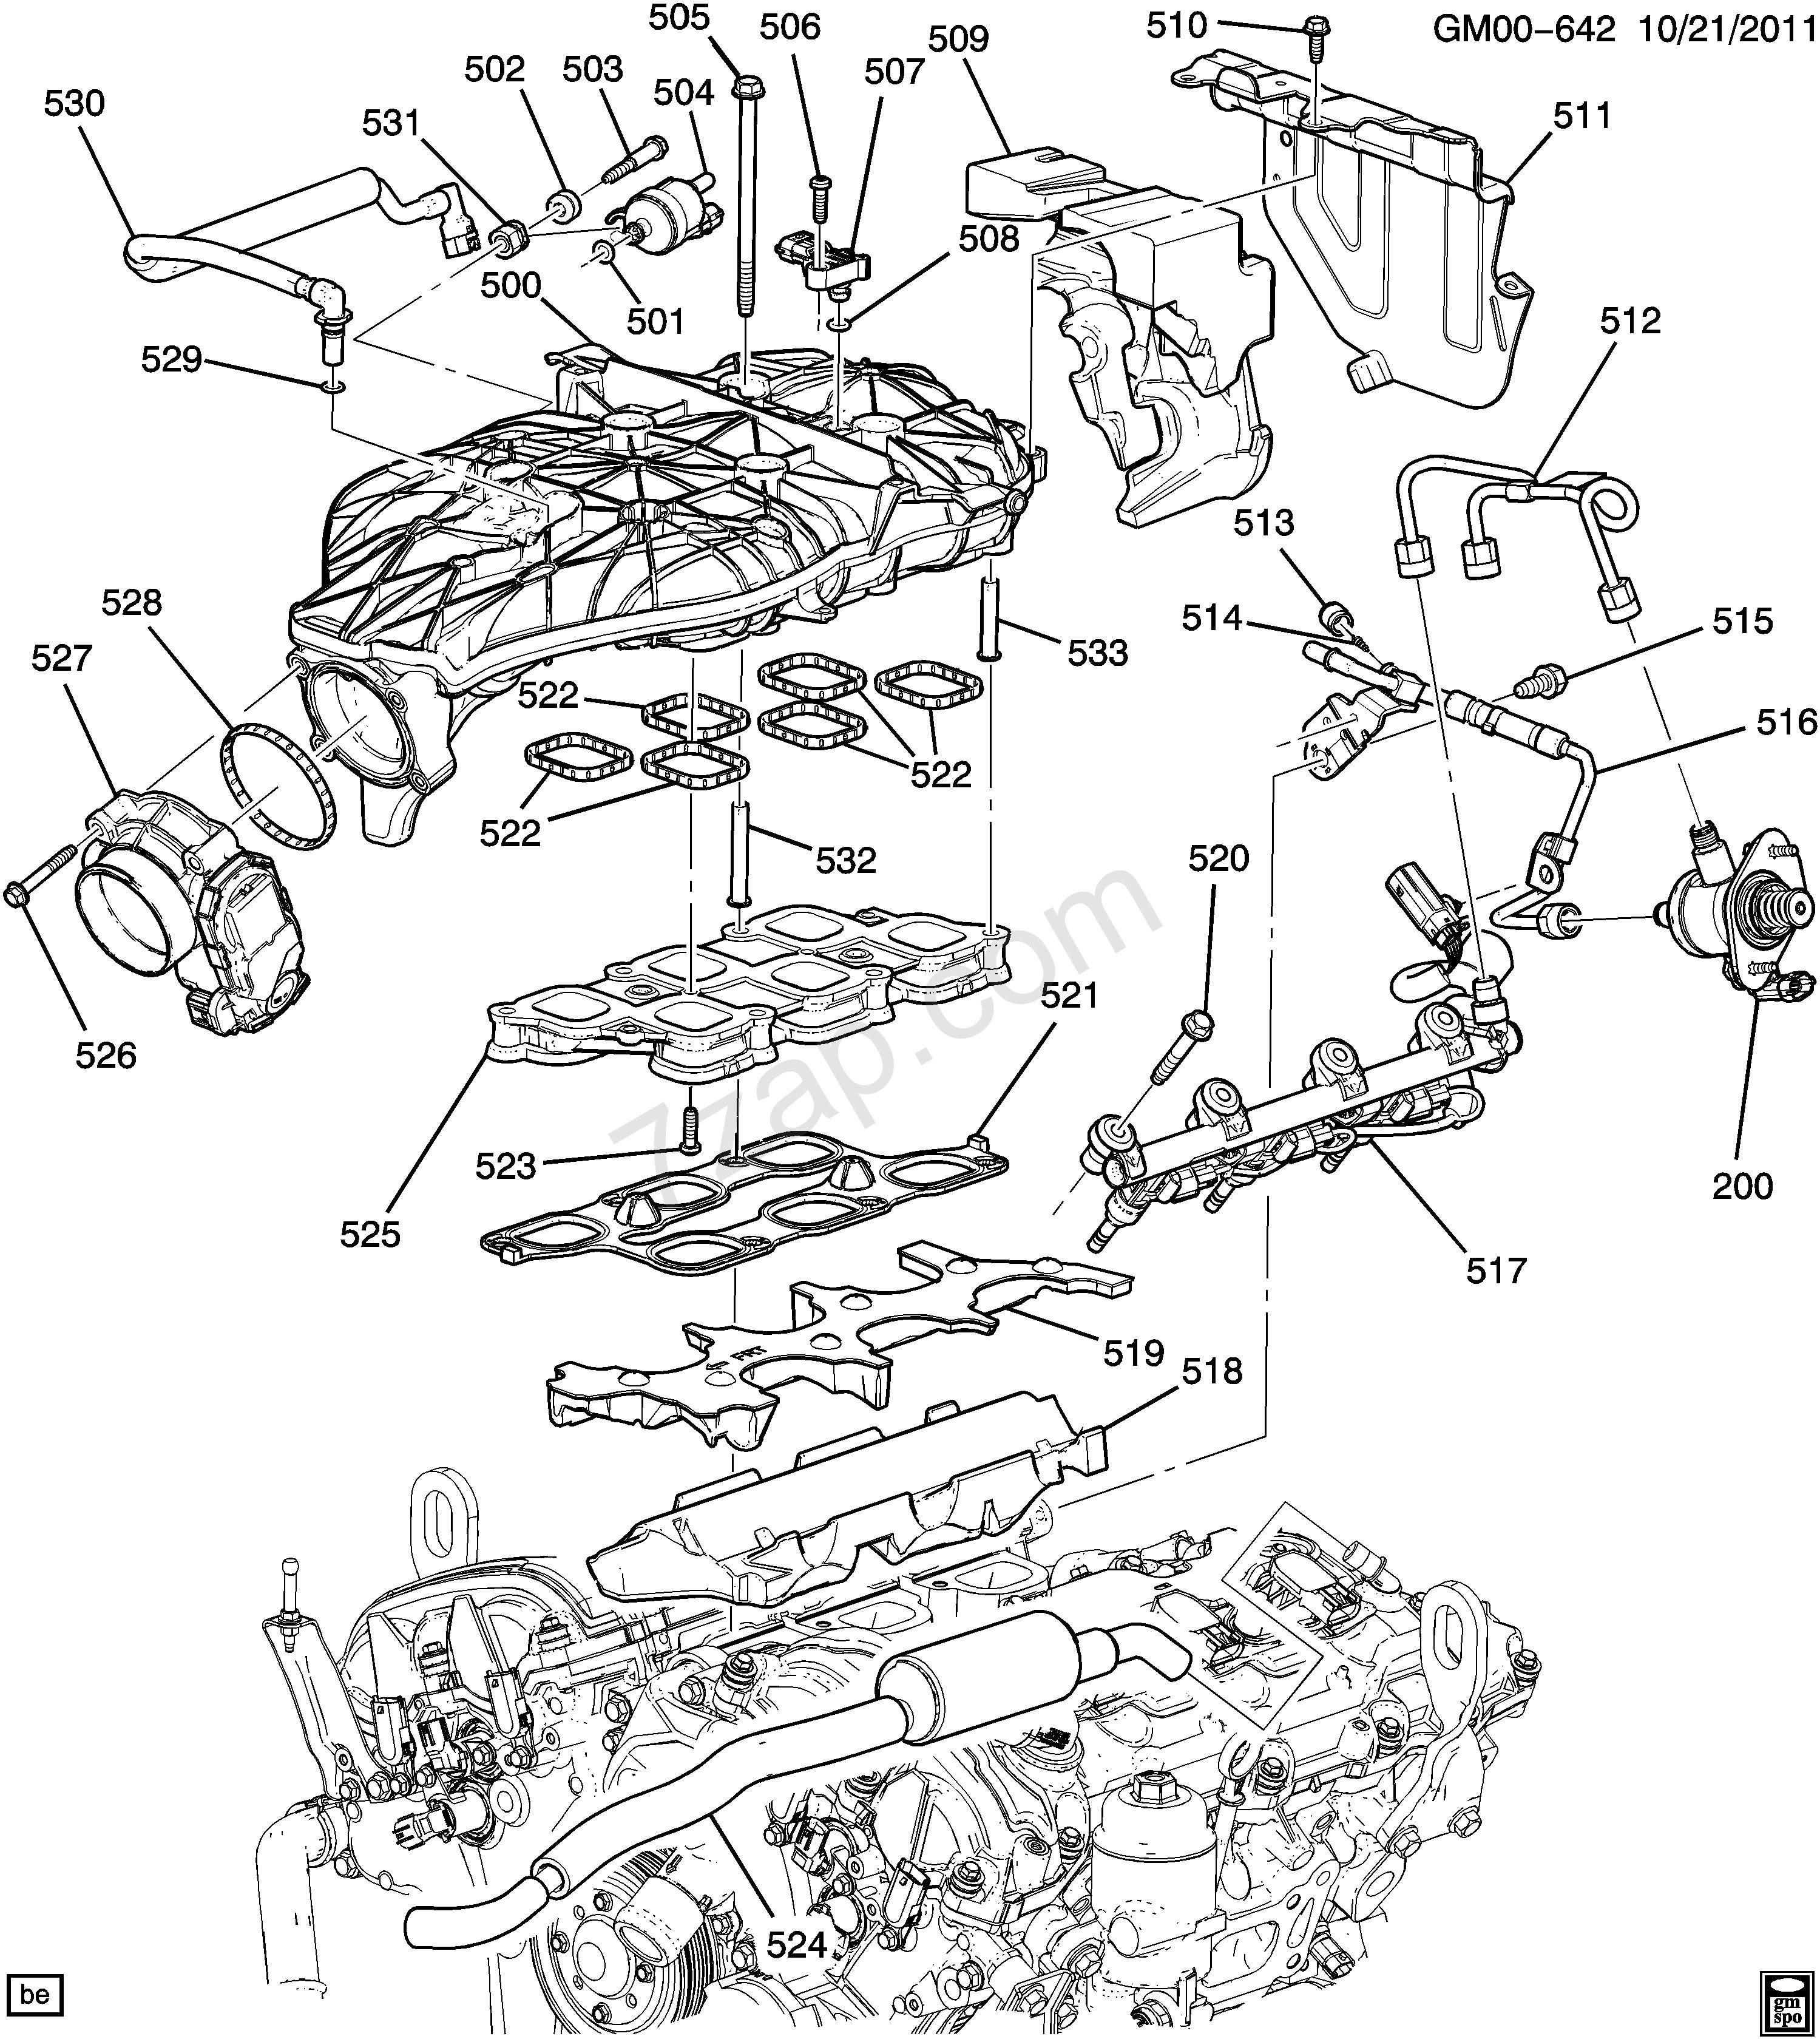 Chevy 6 Engine Parts Diagram Wiring Diagrams Post Core Core Michelegori It